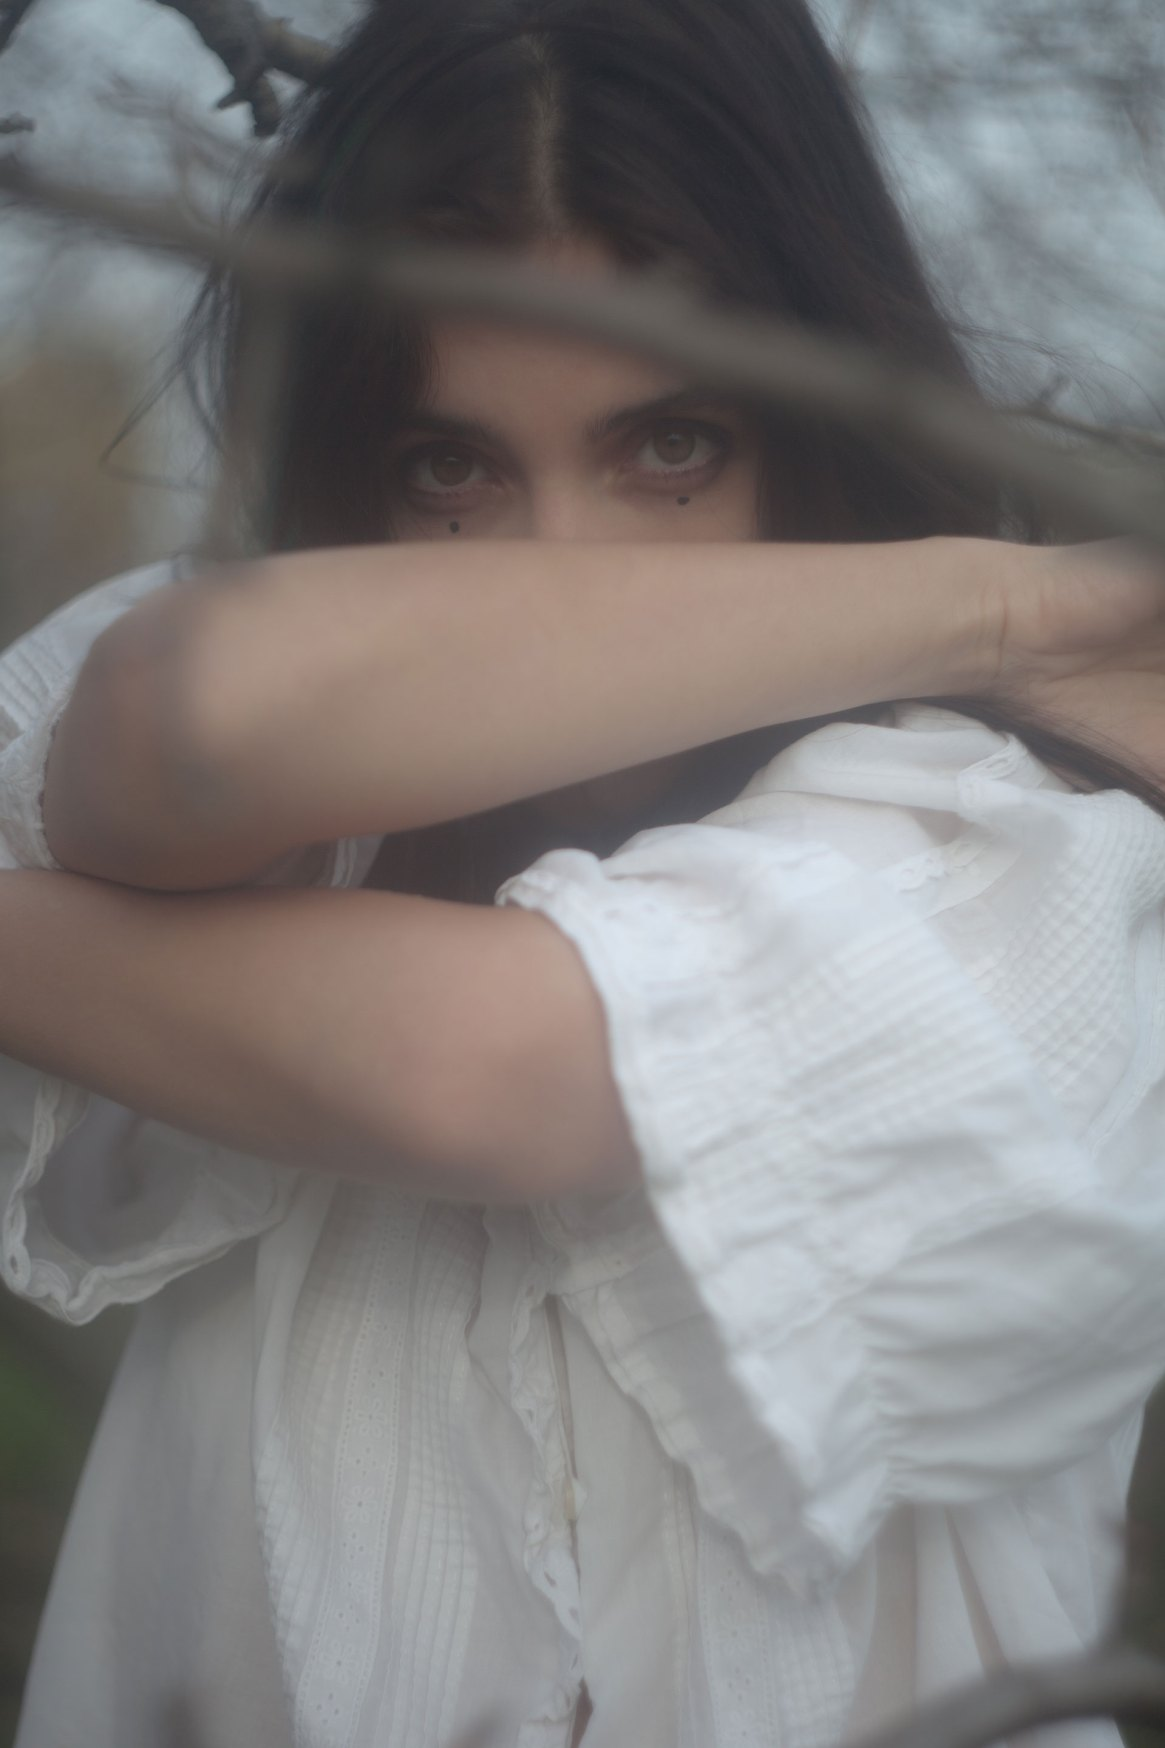 Nadya Tolokonnikova, fundadora de Pussy Riot